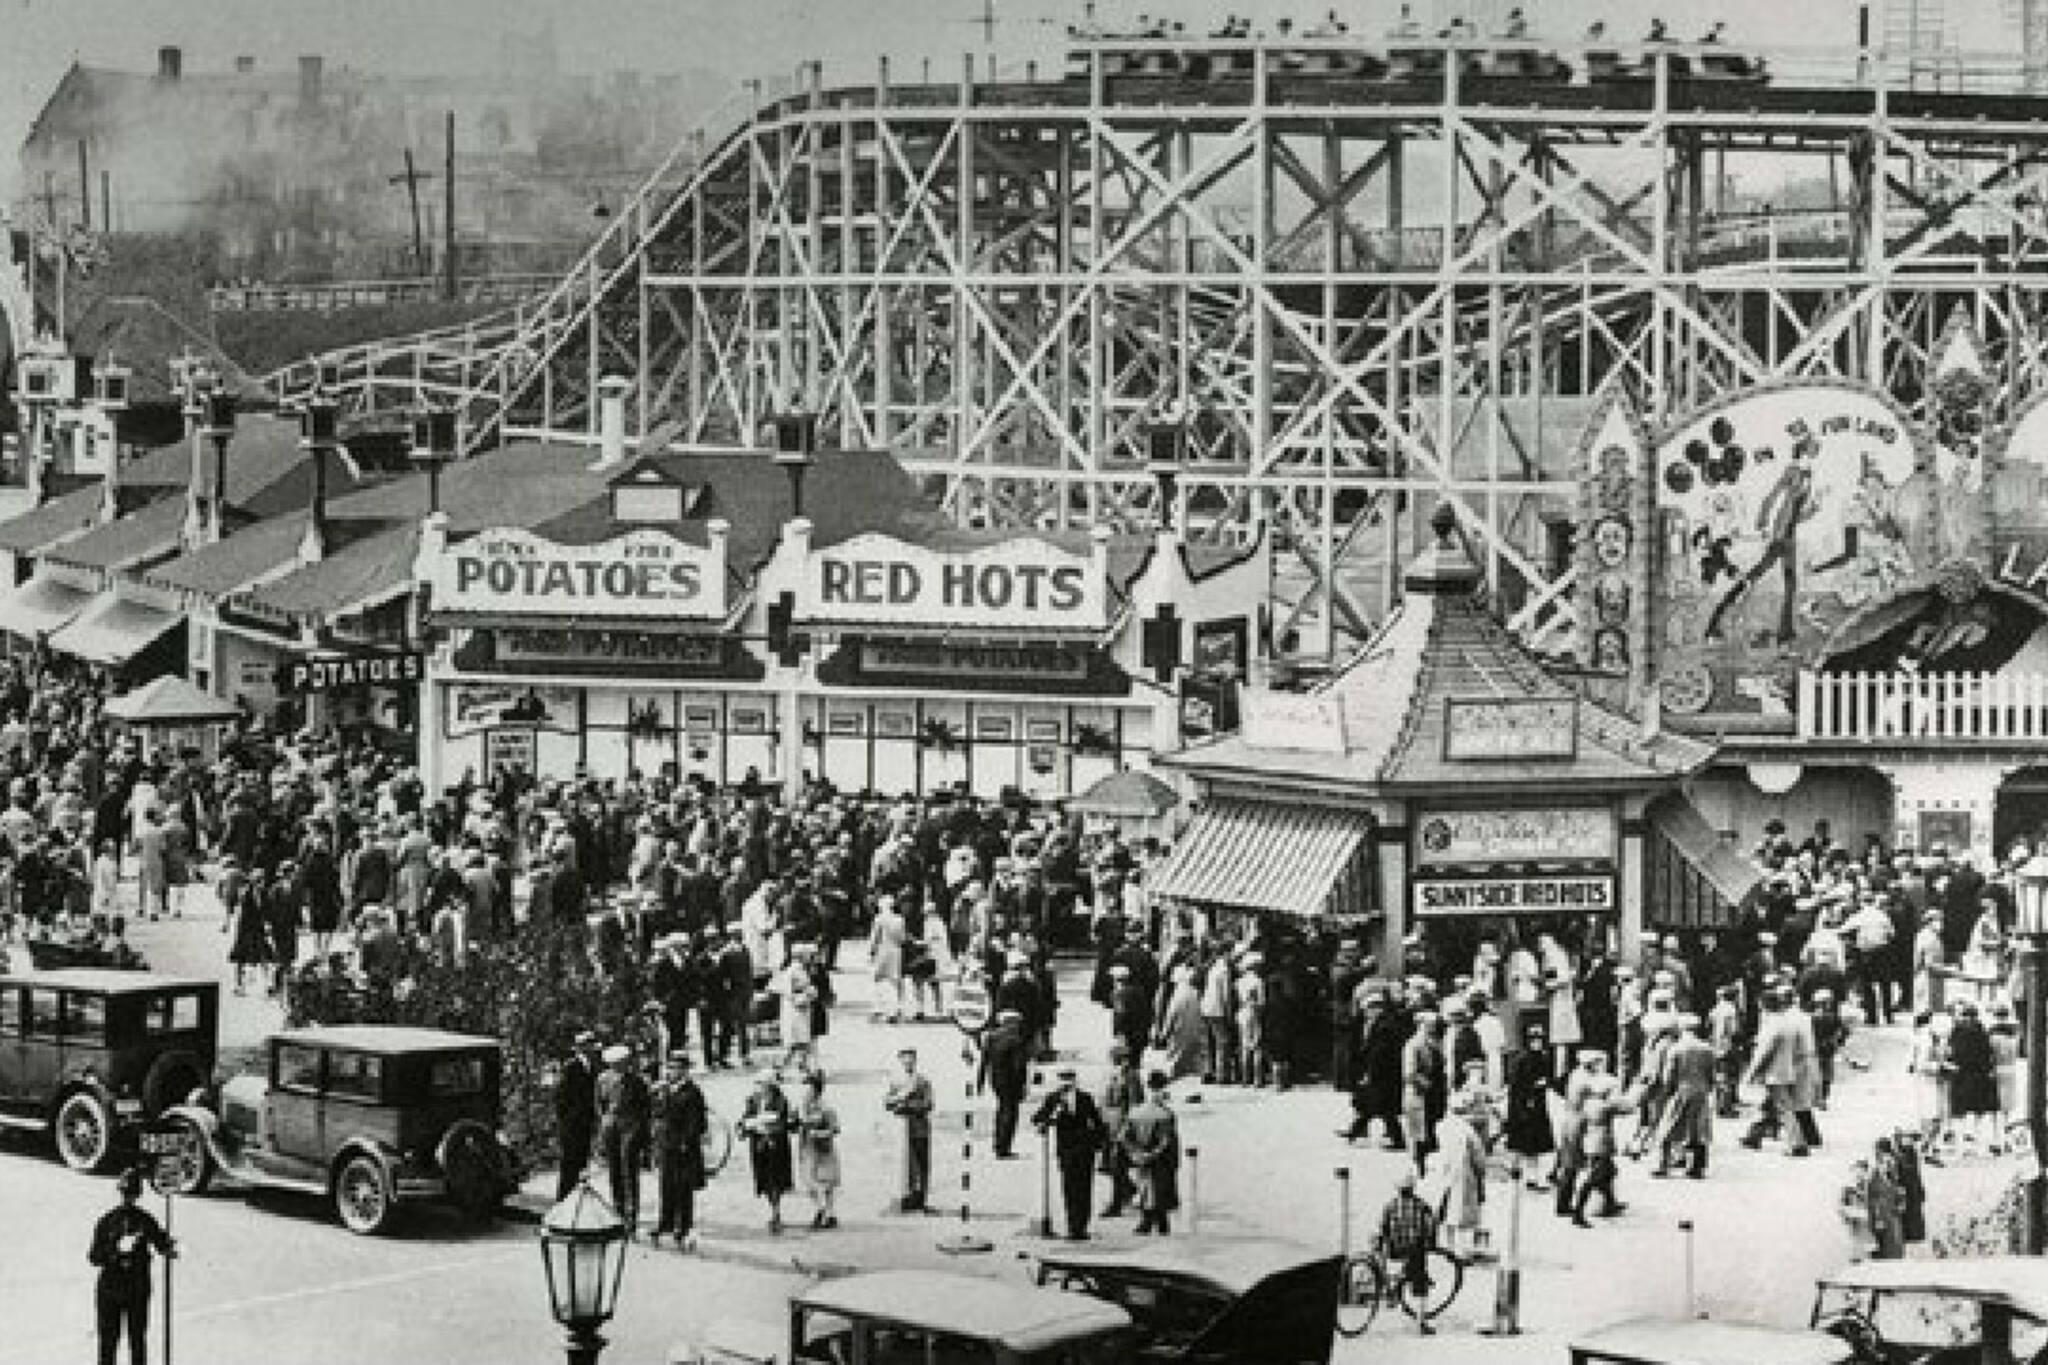 Sunnyside Amusement Park